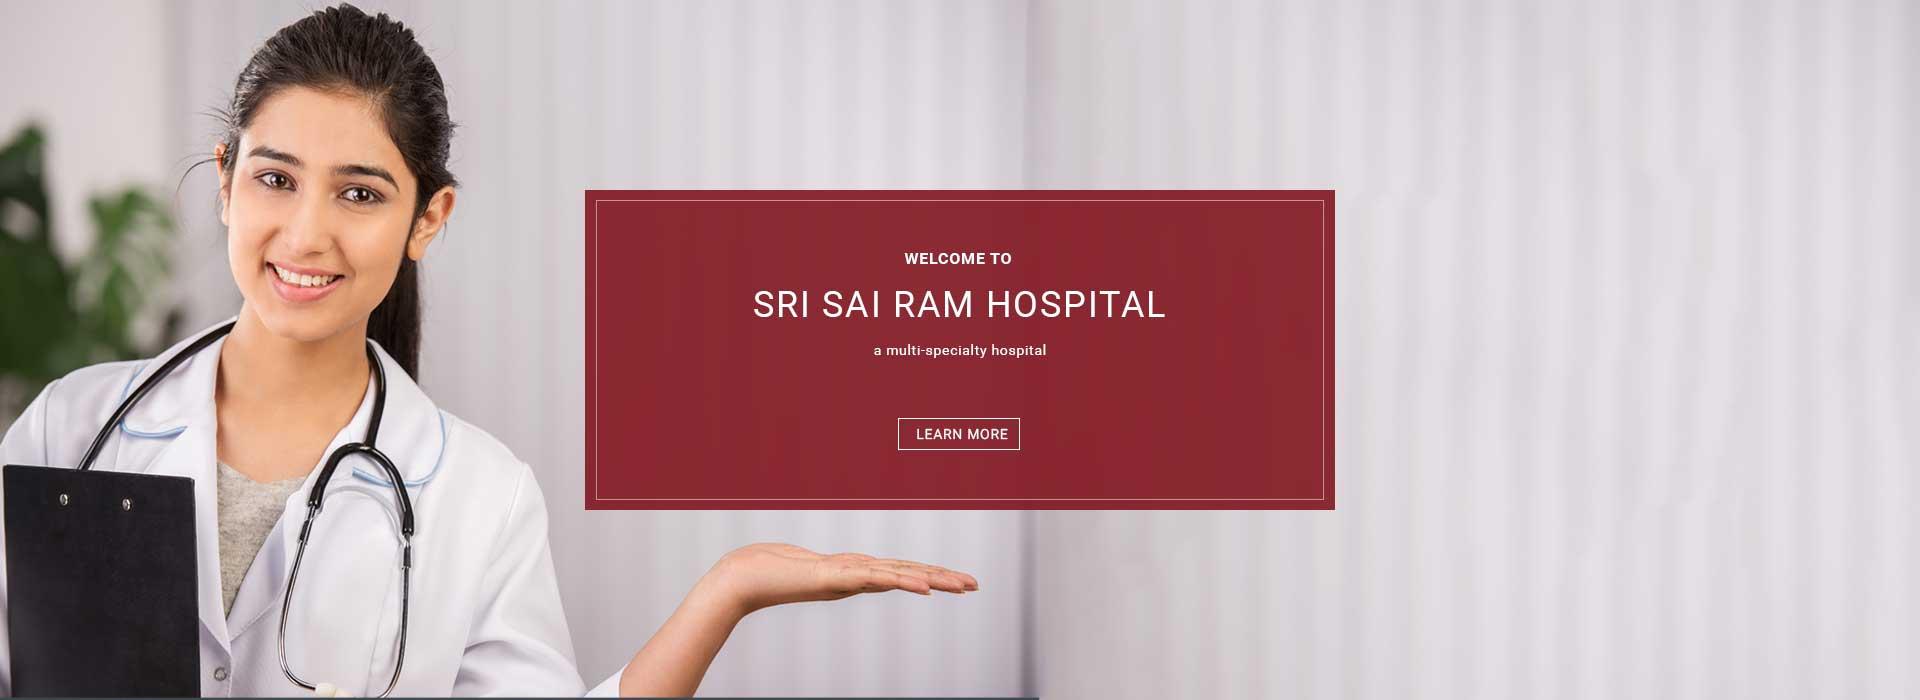 Sri Sai Ram